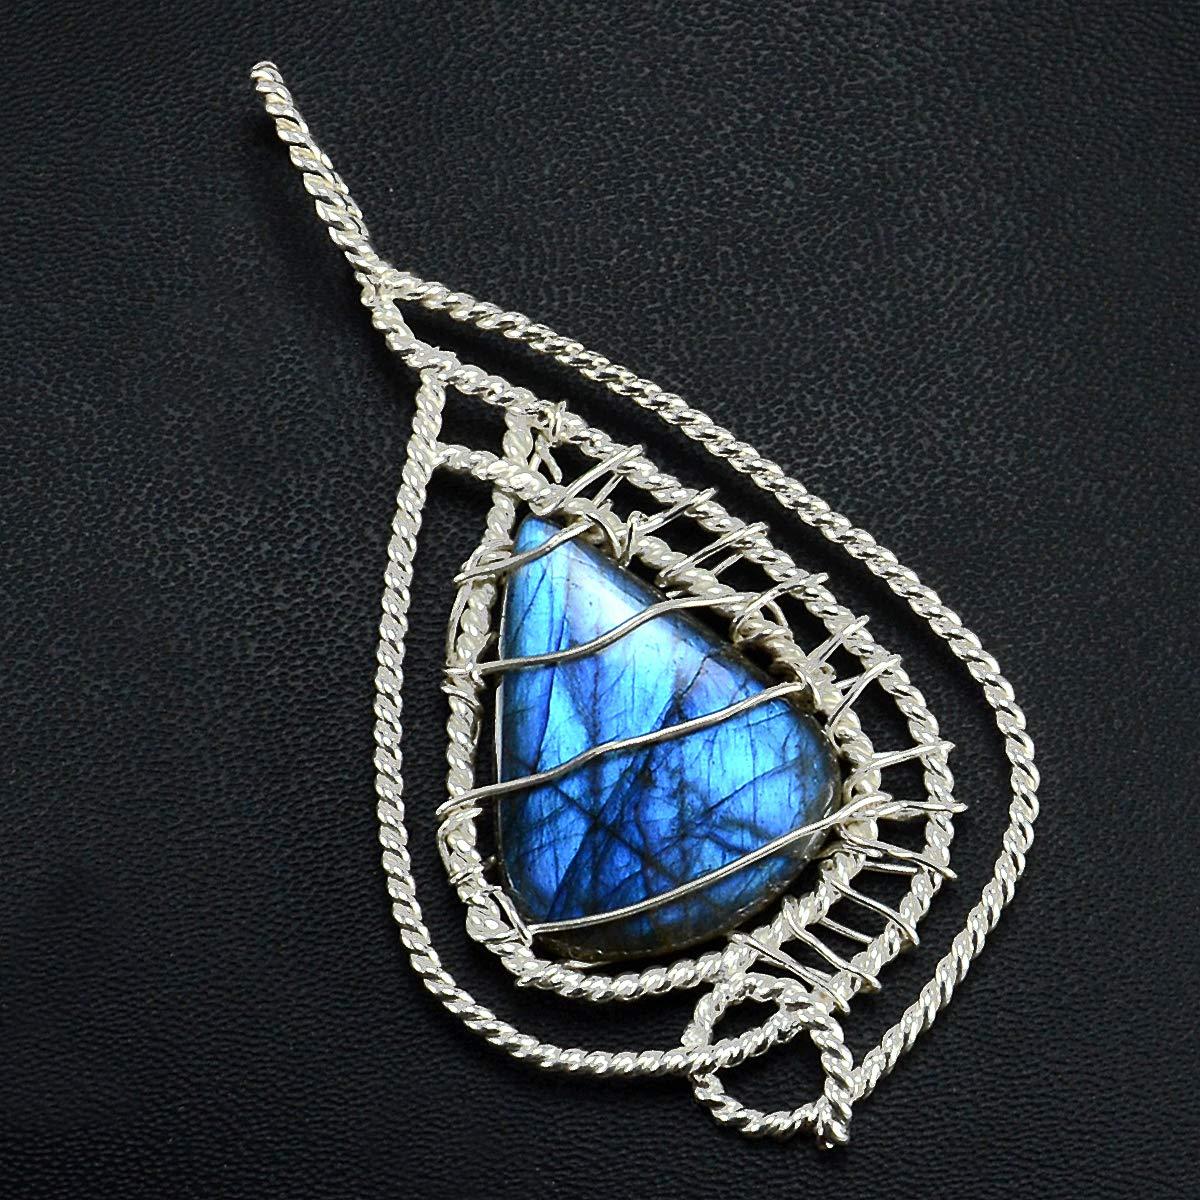 Labradorite Gemstone 925 Sterling Silver Pendant PG-156205